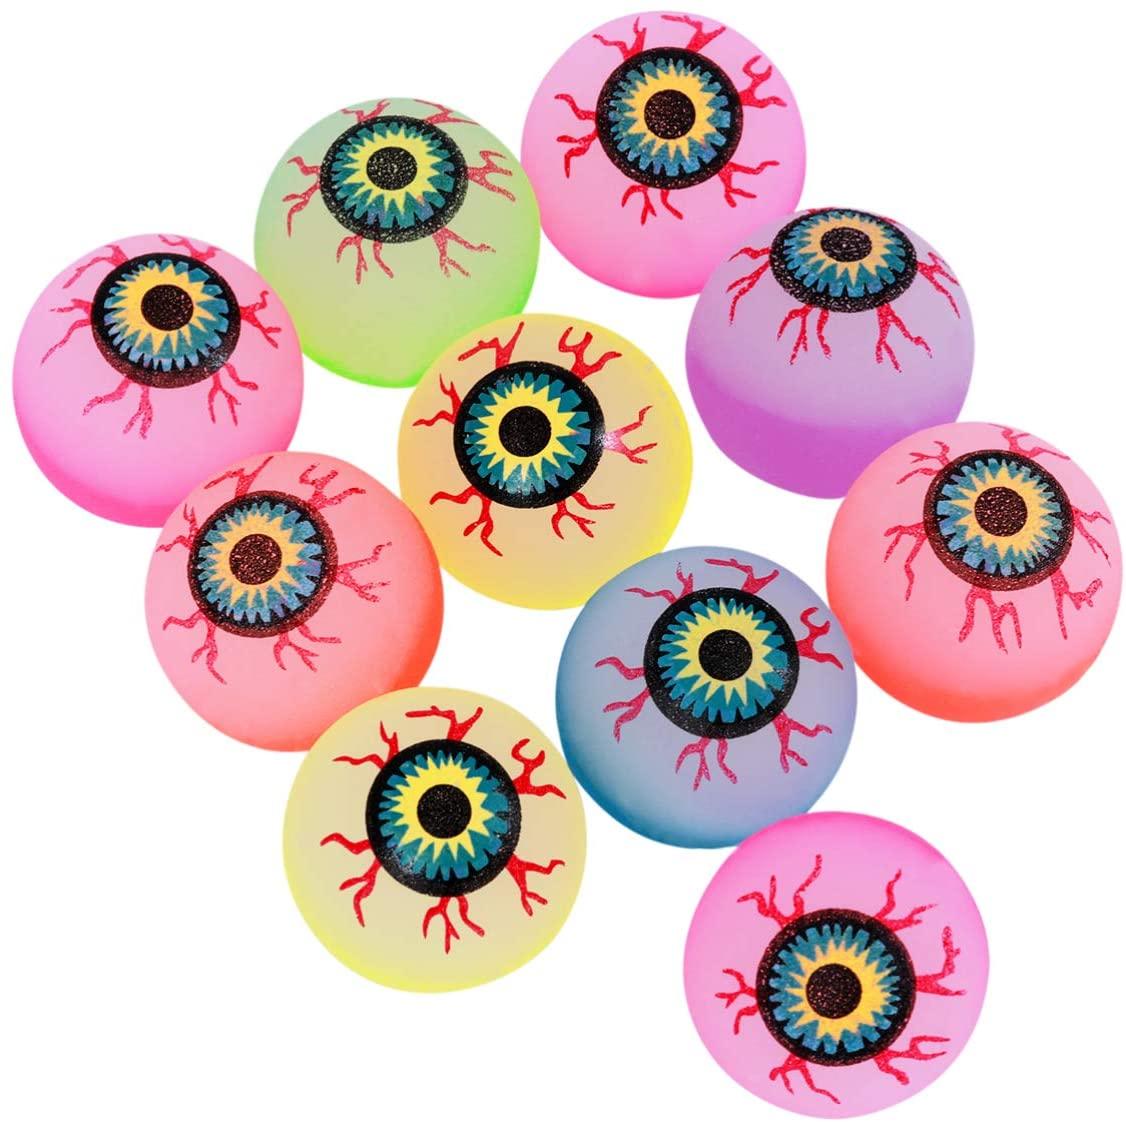 NUOBESTY 10Pcs Halloween Fake Eyeballs Bouncing Eyeball Glow in The Dark Terror Props for Halloween Treats Masks Skulls Party Supplies 32mm Mixed Color